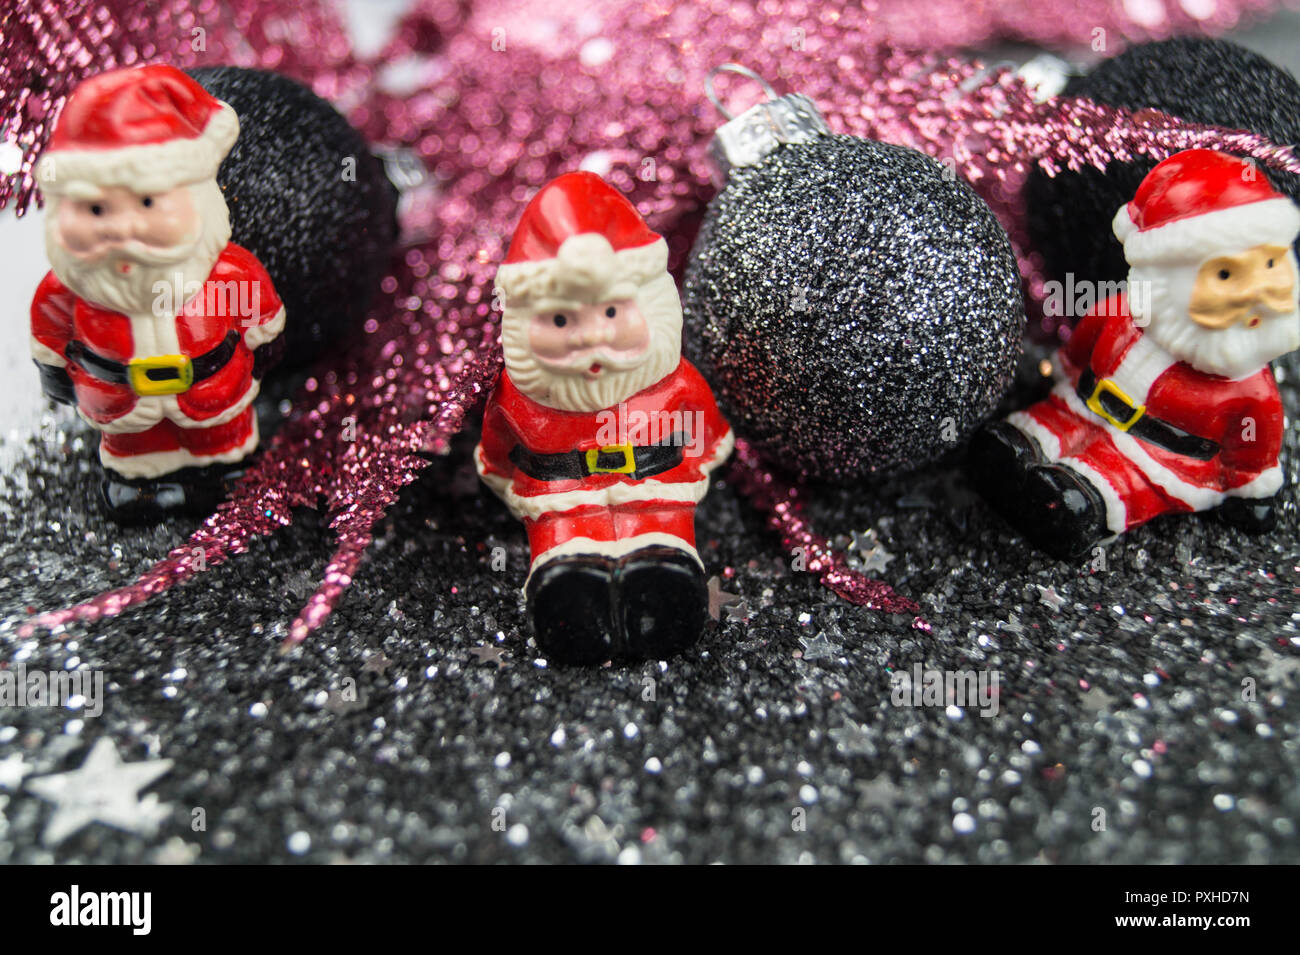 Annual Christmas decoration - Stock Image